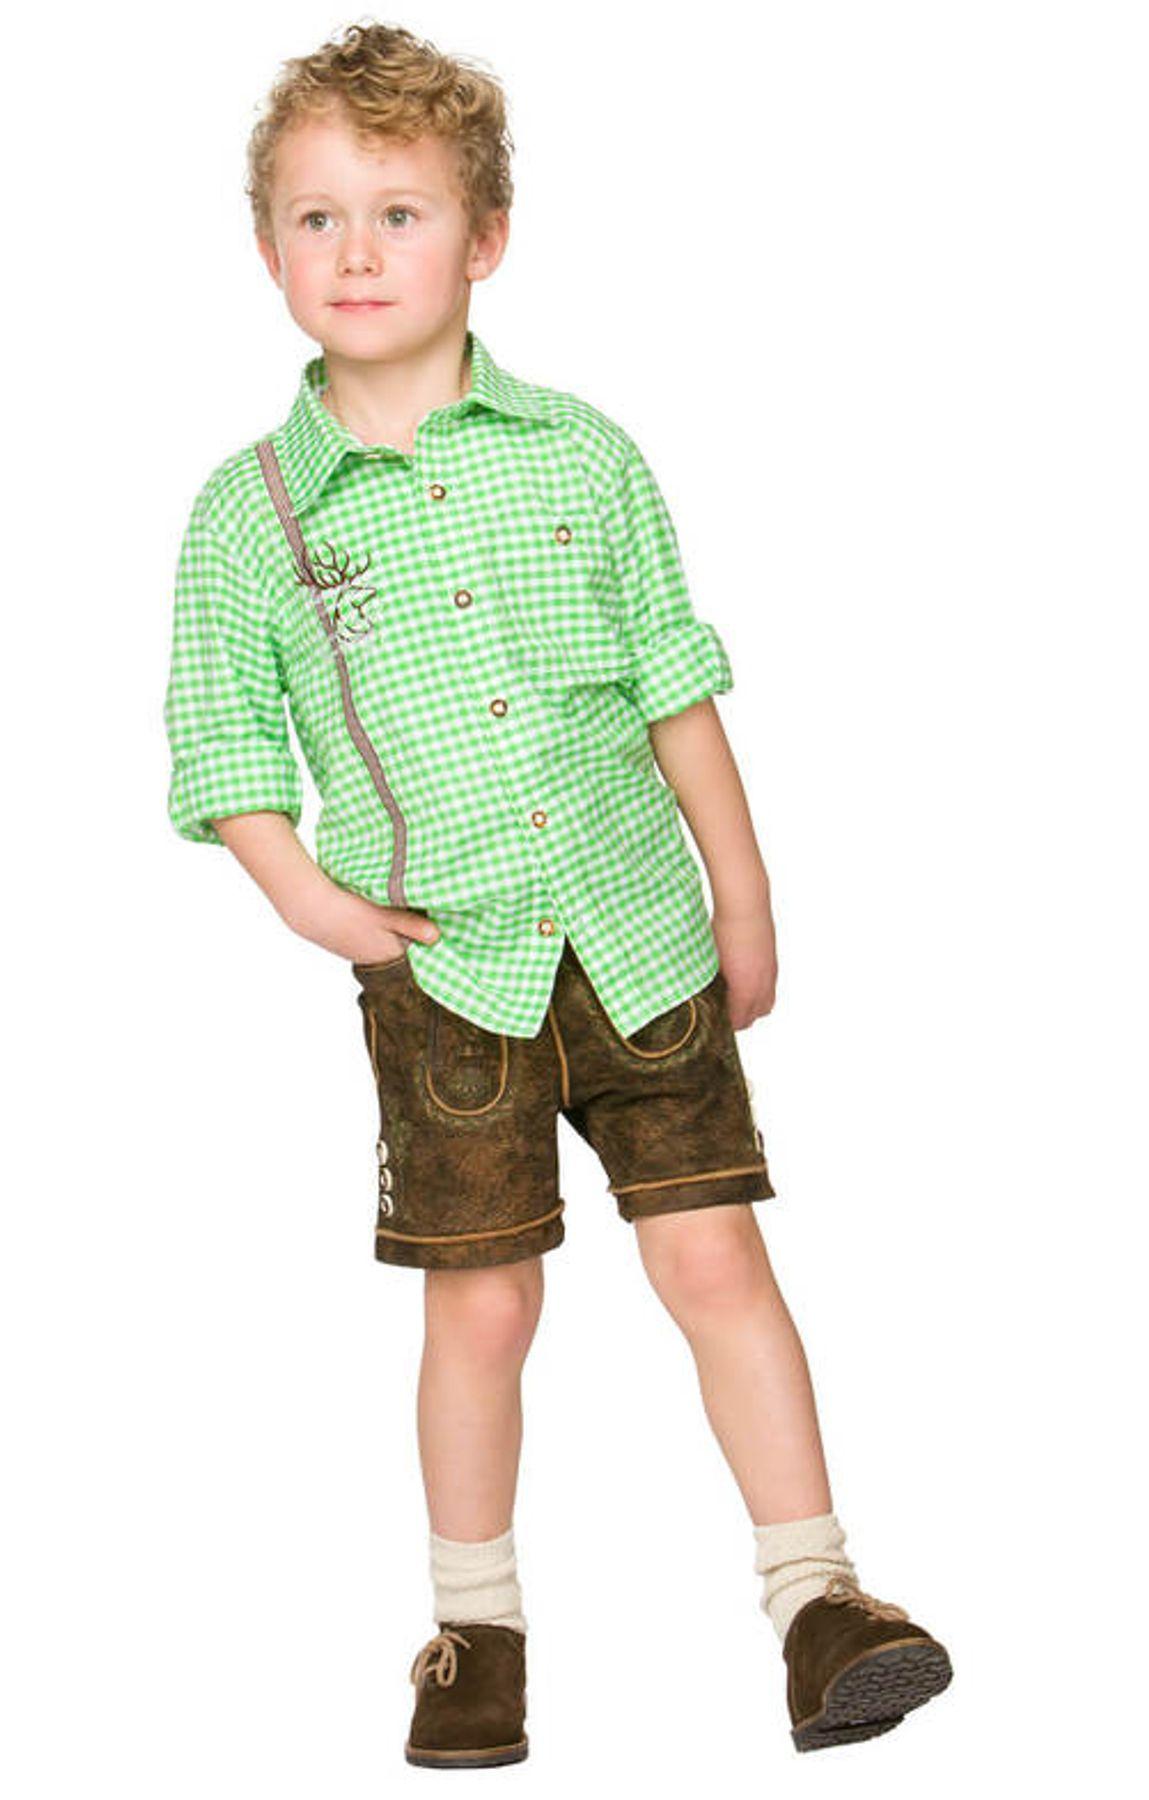 Stockerpoint - Kinder Trachten Hemd Leo, Gr. 86-116 – Bild 4